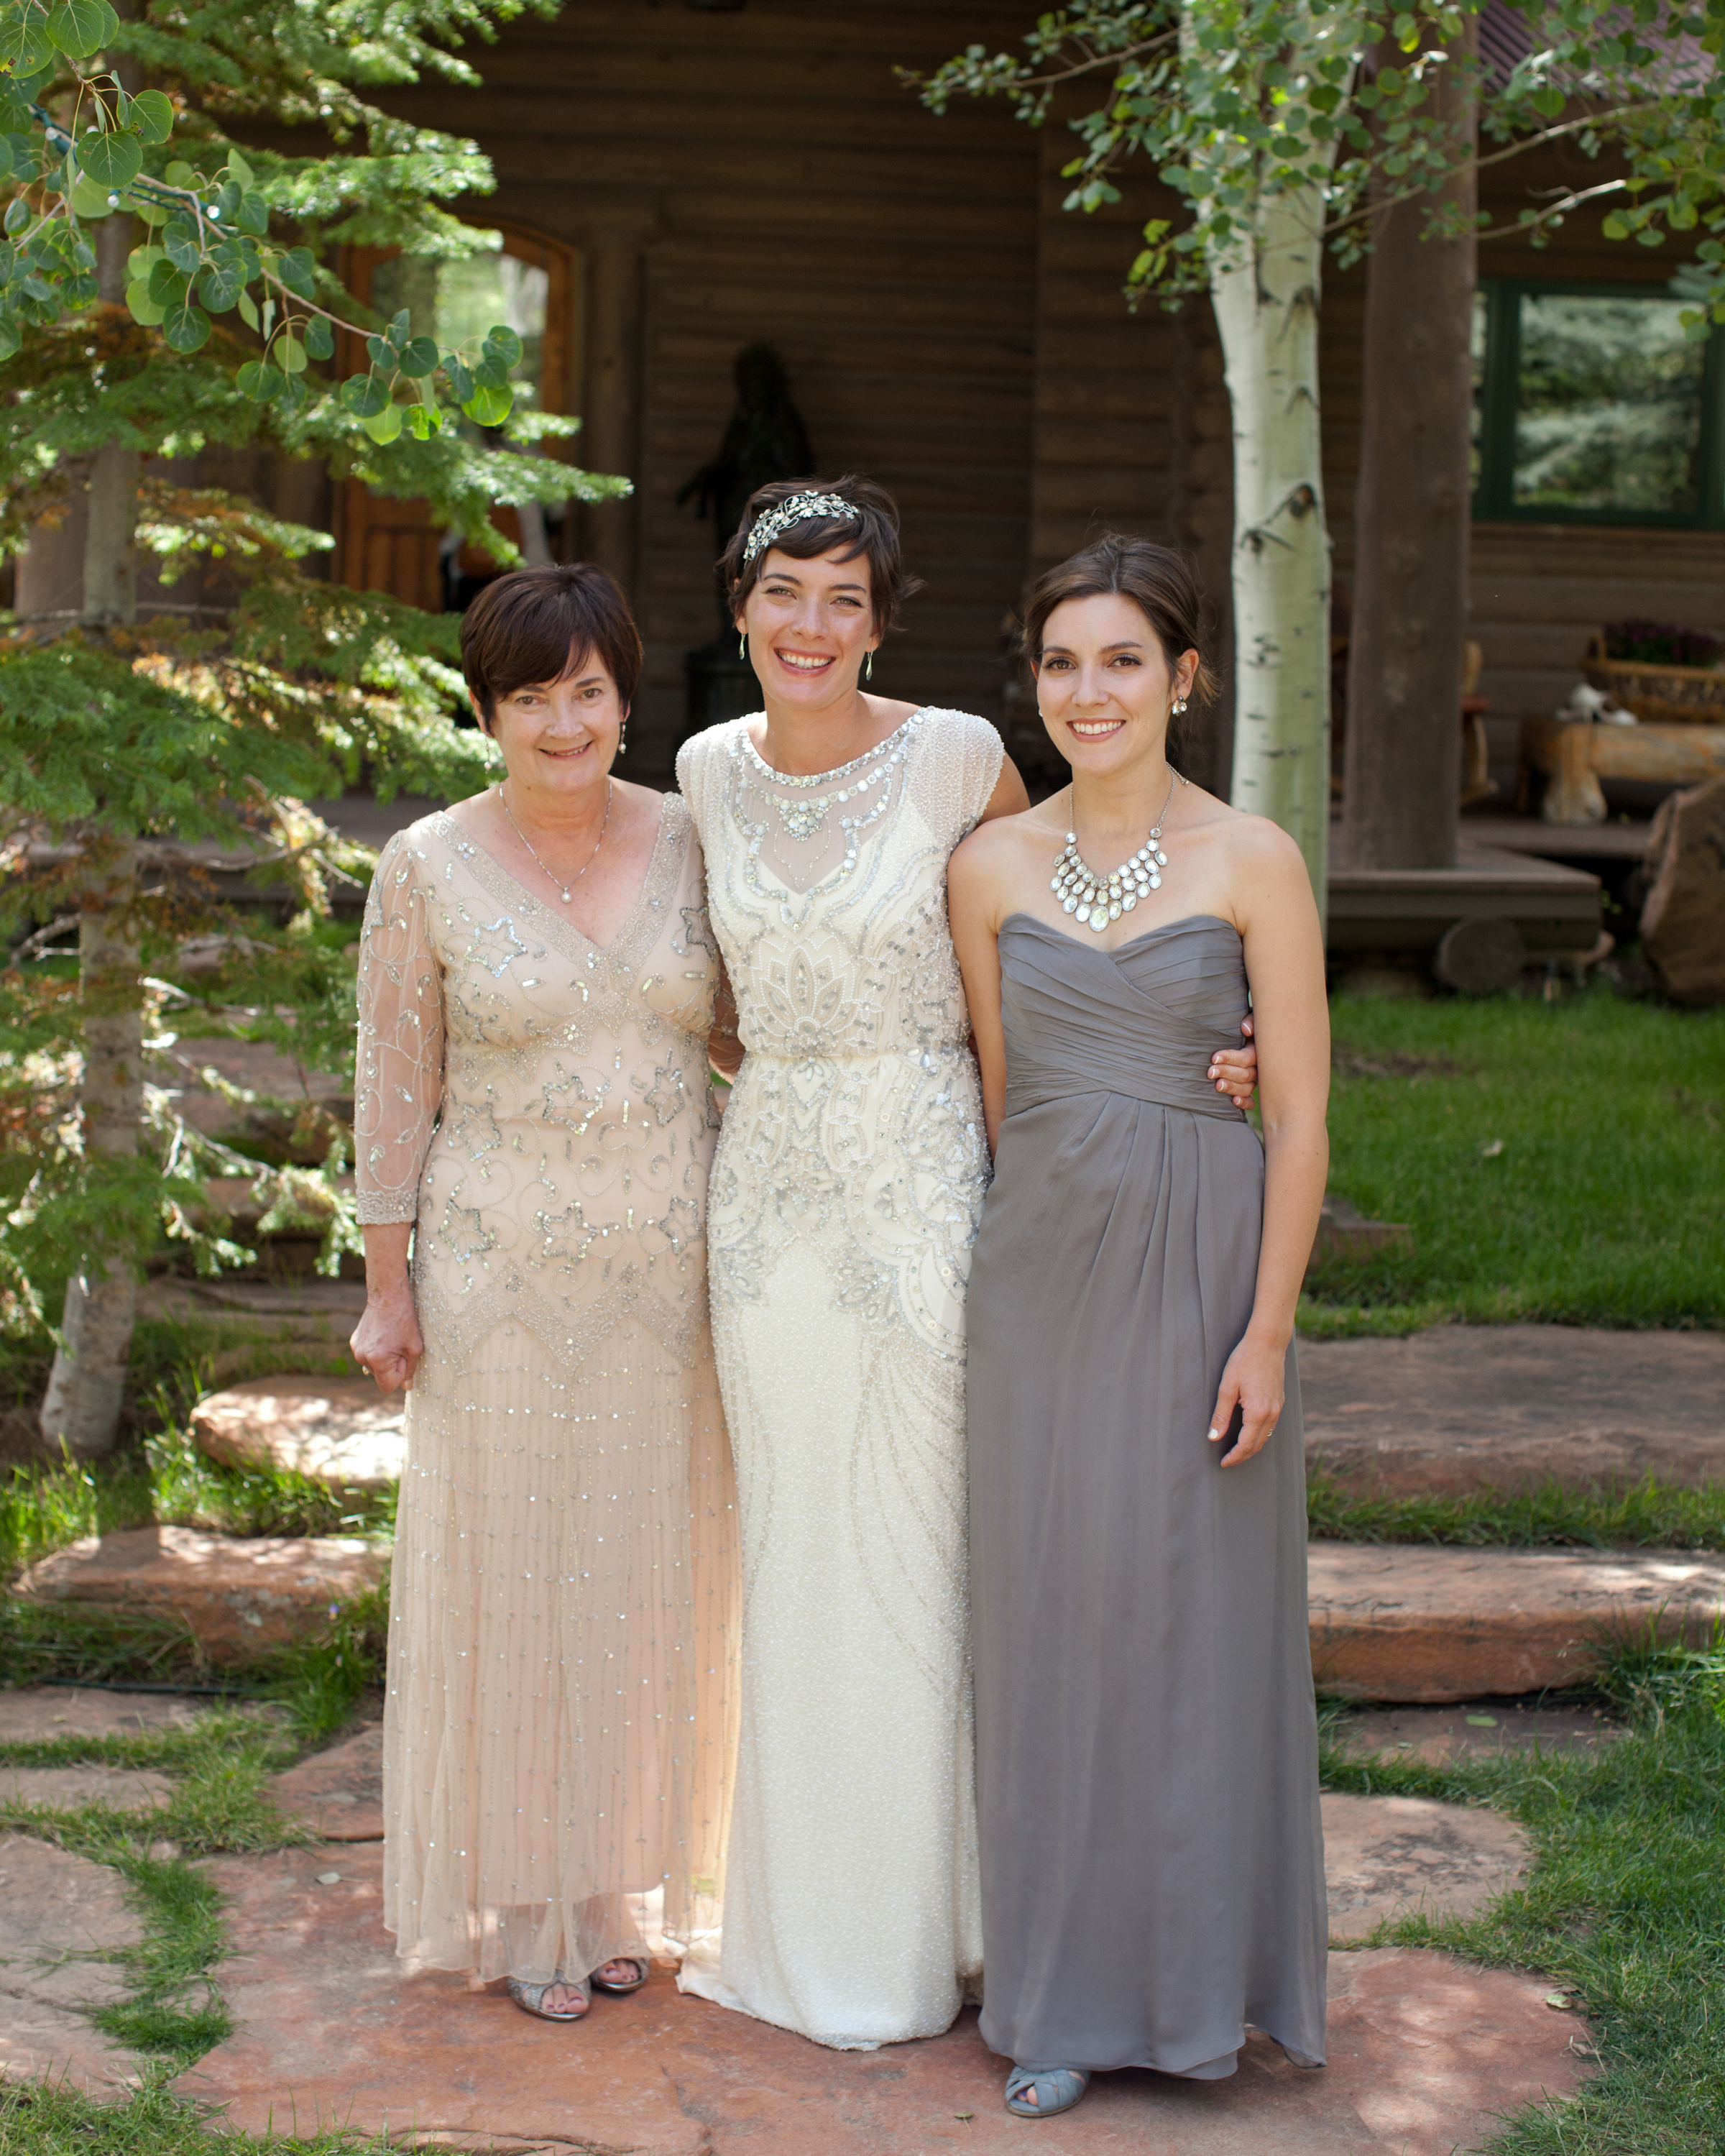 lizzy-pat-wedding-family-074-s111777-0115.jpg